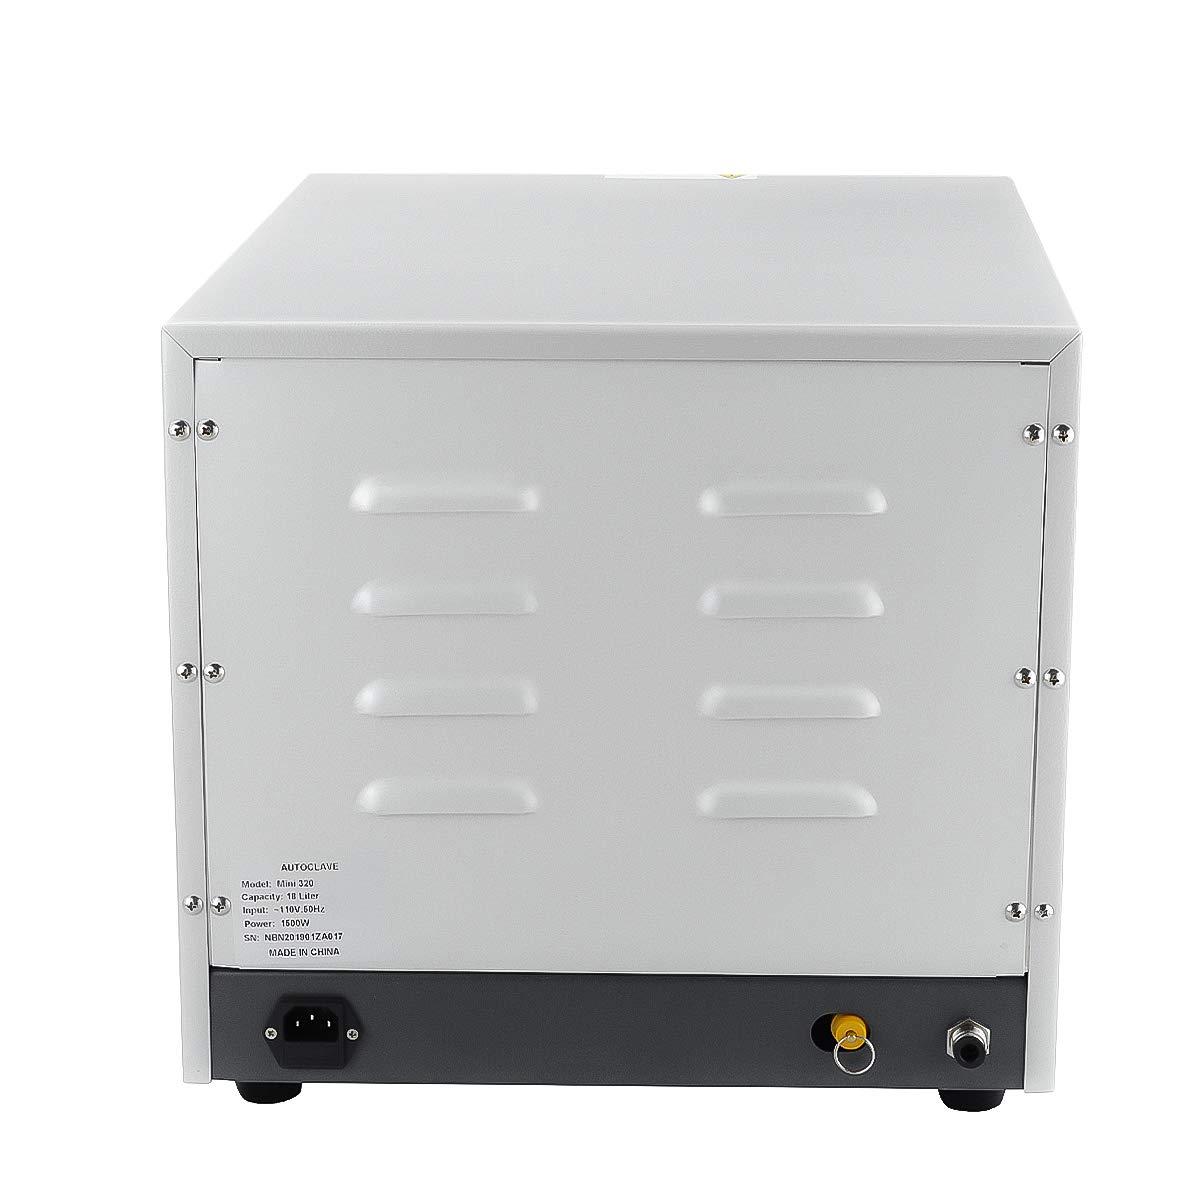 SOHOME 18L MINI320 Digital Display Autoclave Steam Lab Machine by SoHome (Image #8)